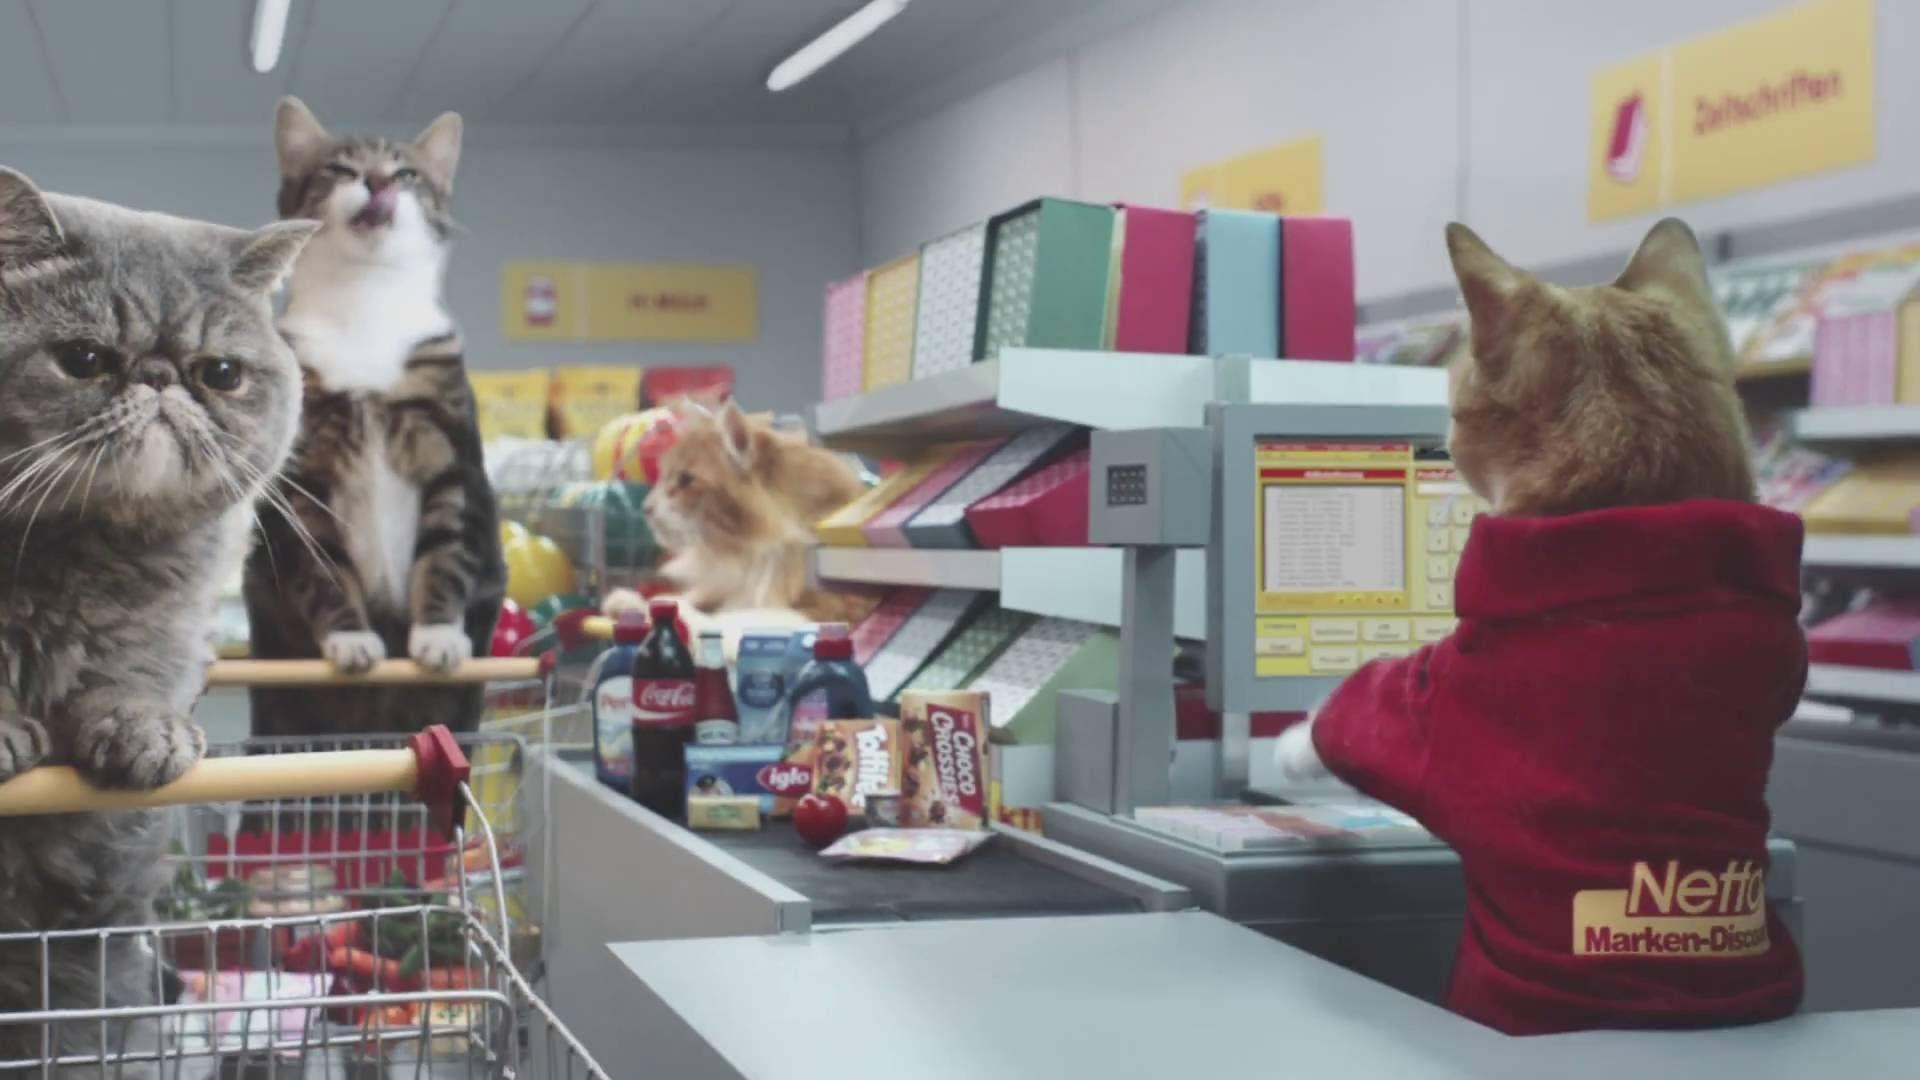 Cats at supermarket